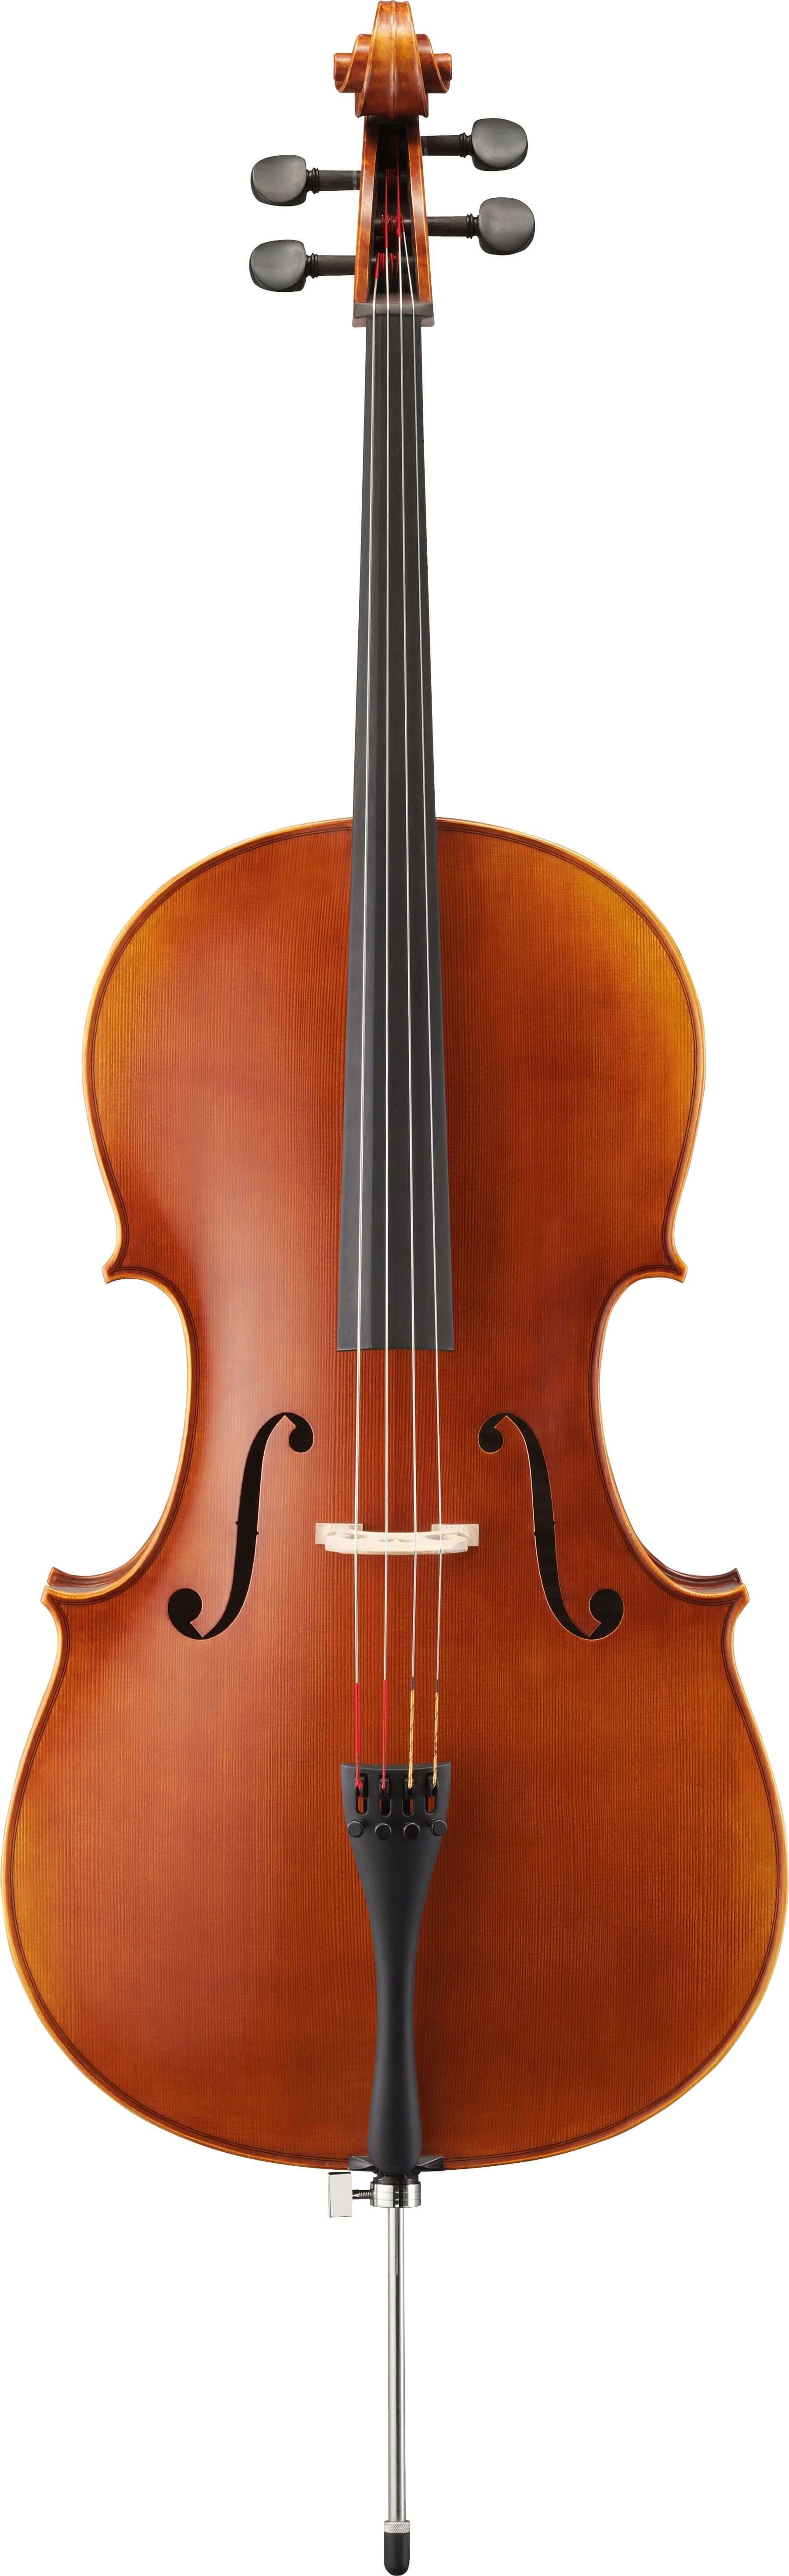 Violoncello Yamaha VC20G 4/4